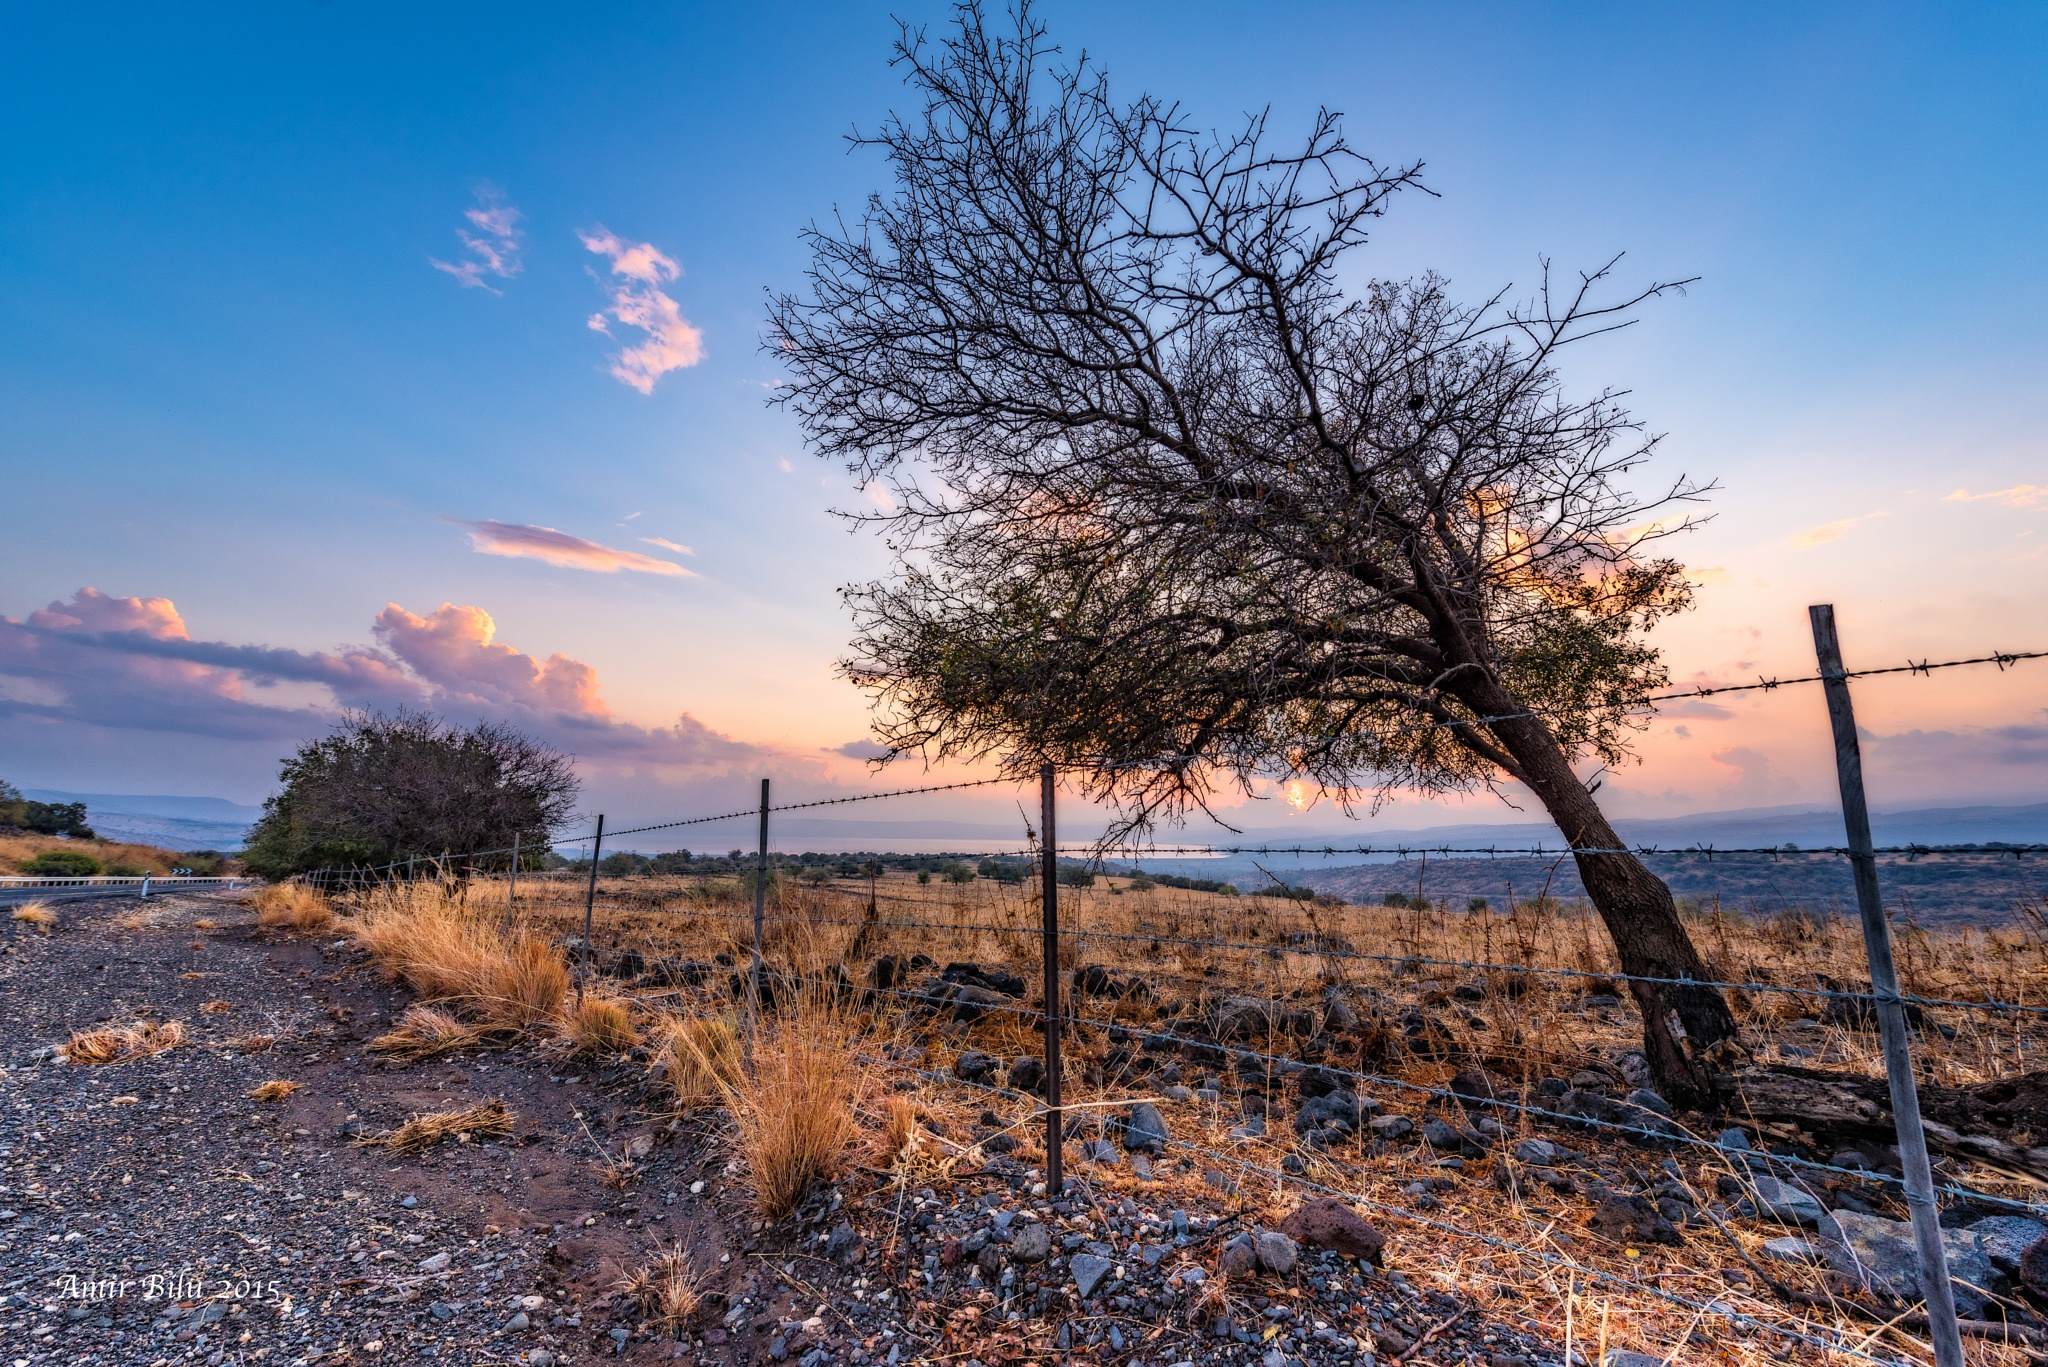 Golan Heights At sunset by Amir Bilu